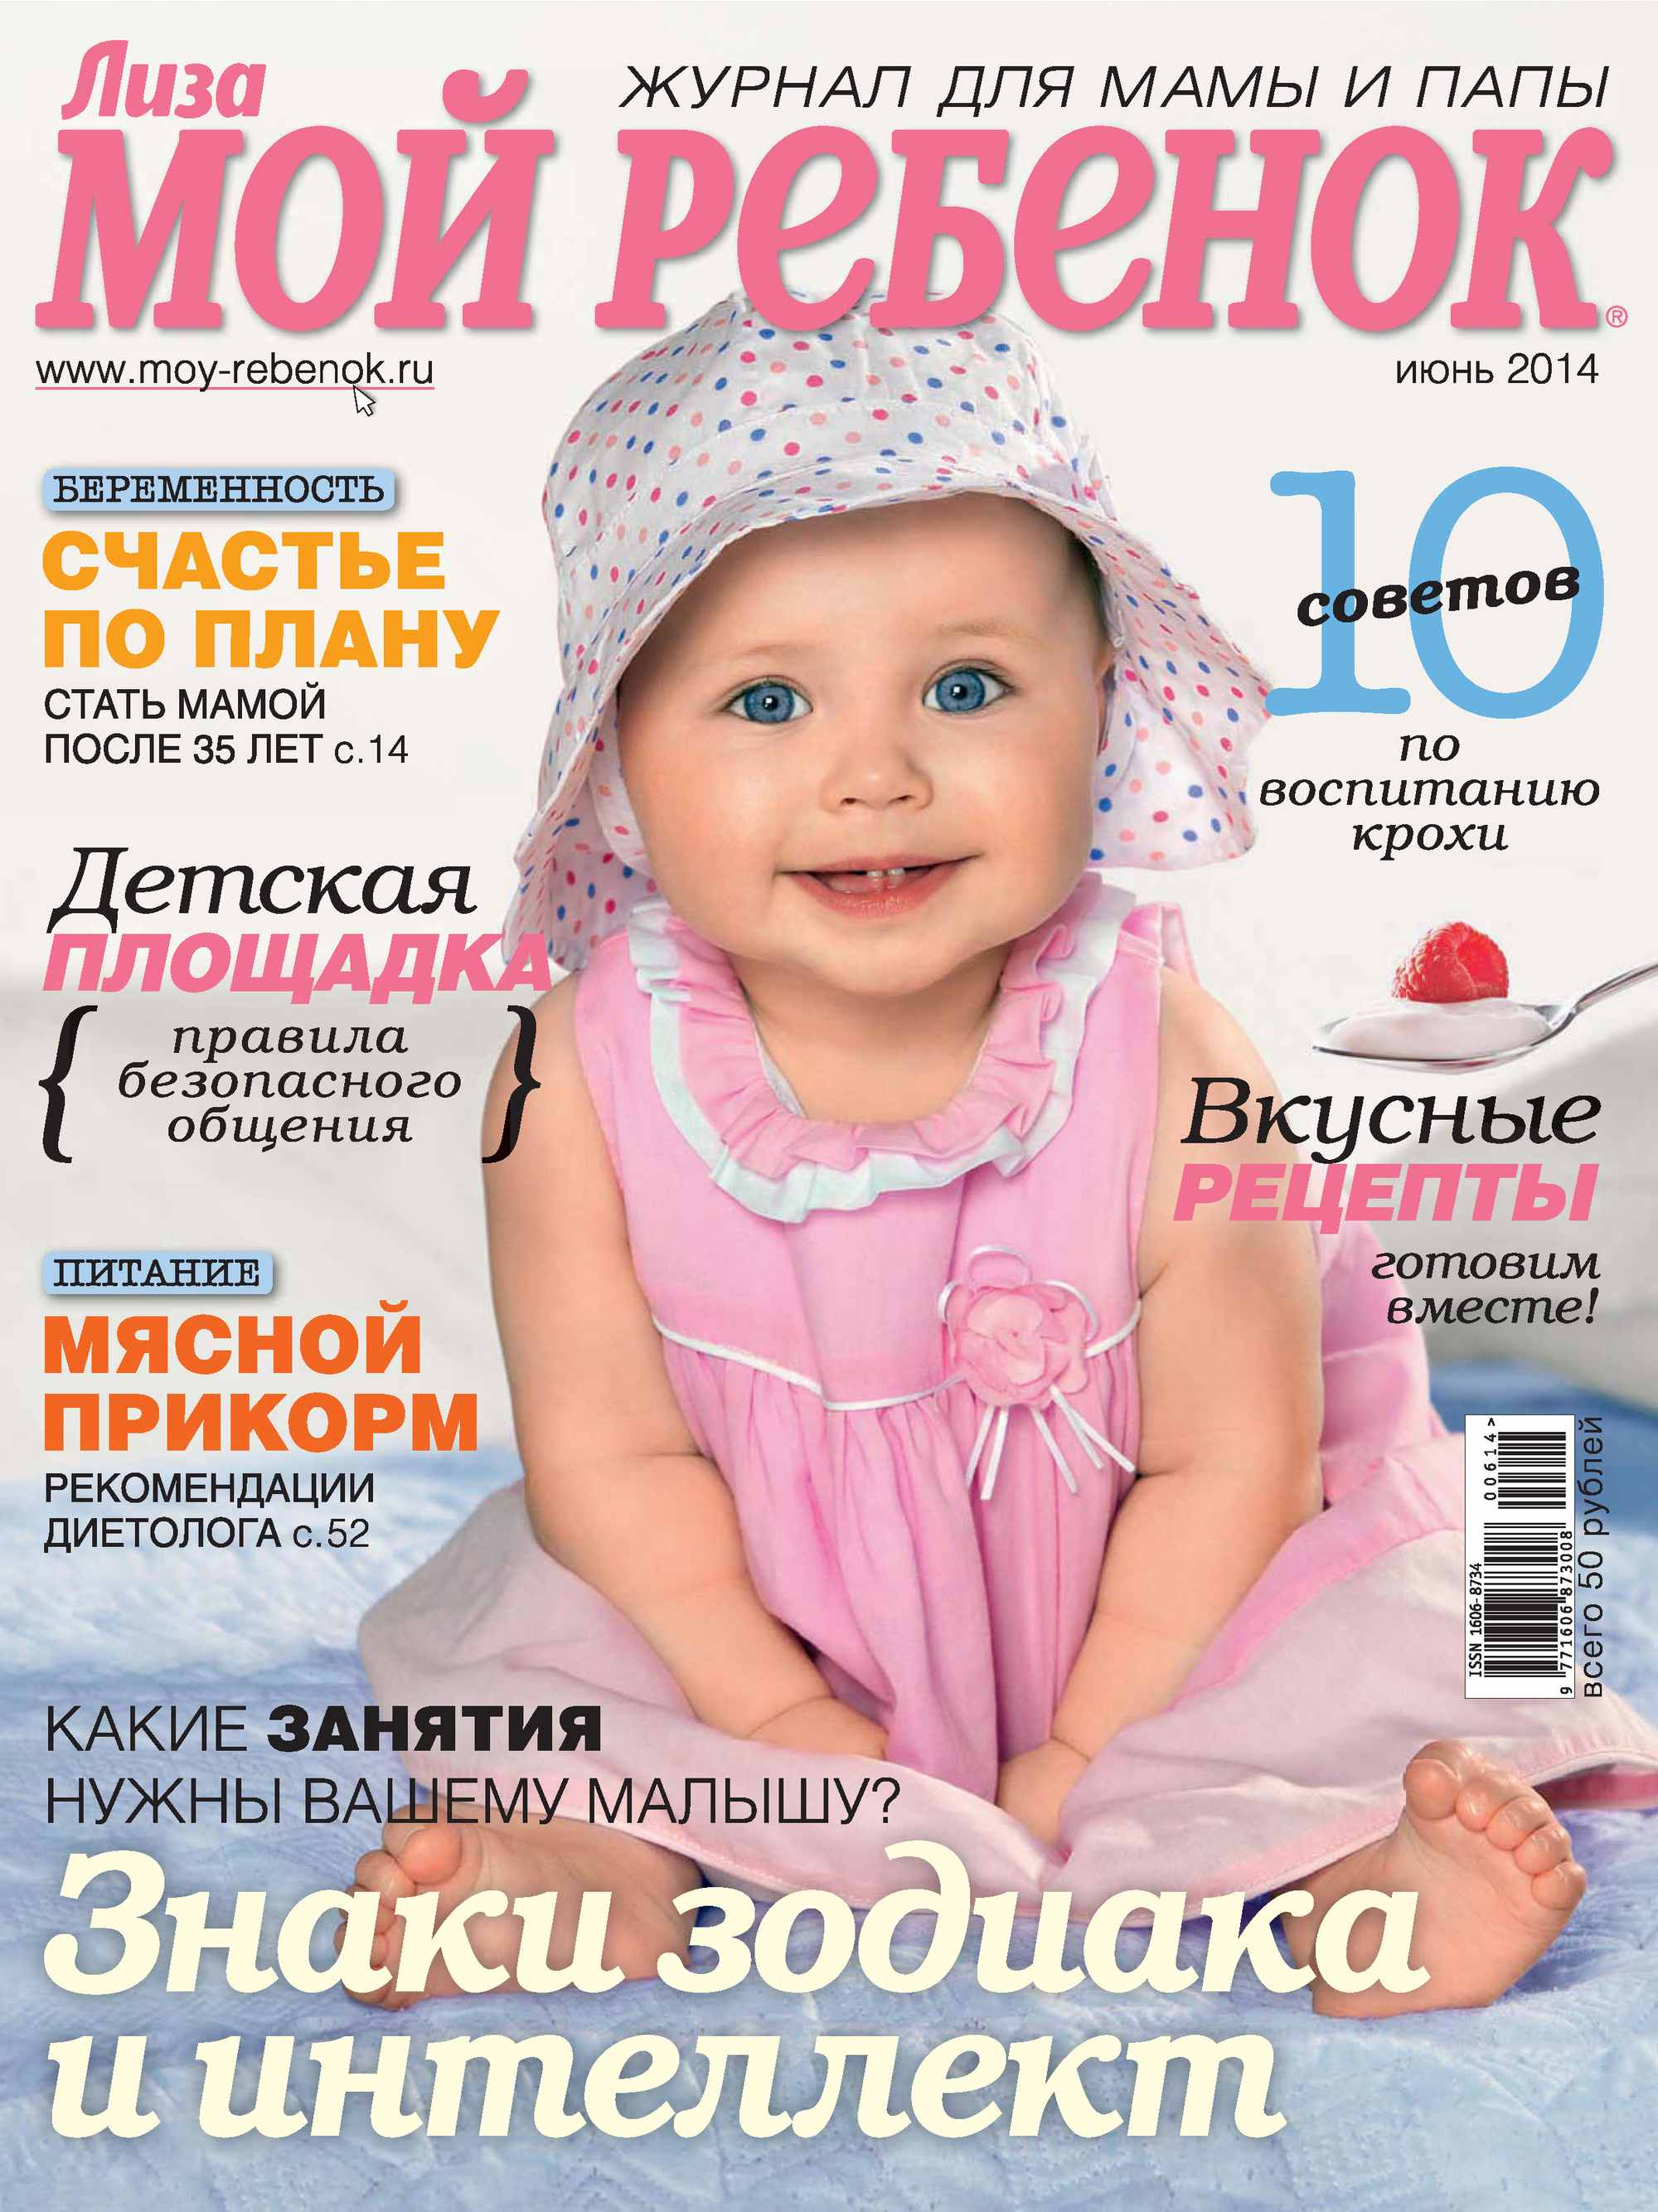 ИД «Бурда» Журнал «Лиза. Мой ребенок» №06/2014 ид бурда журнал лиза мой ребенок 11 2014